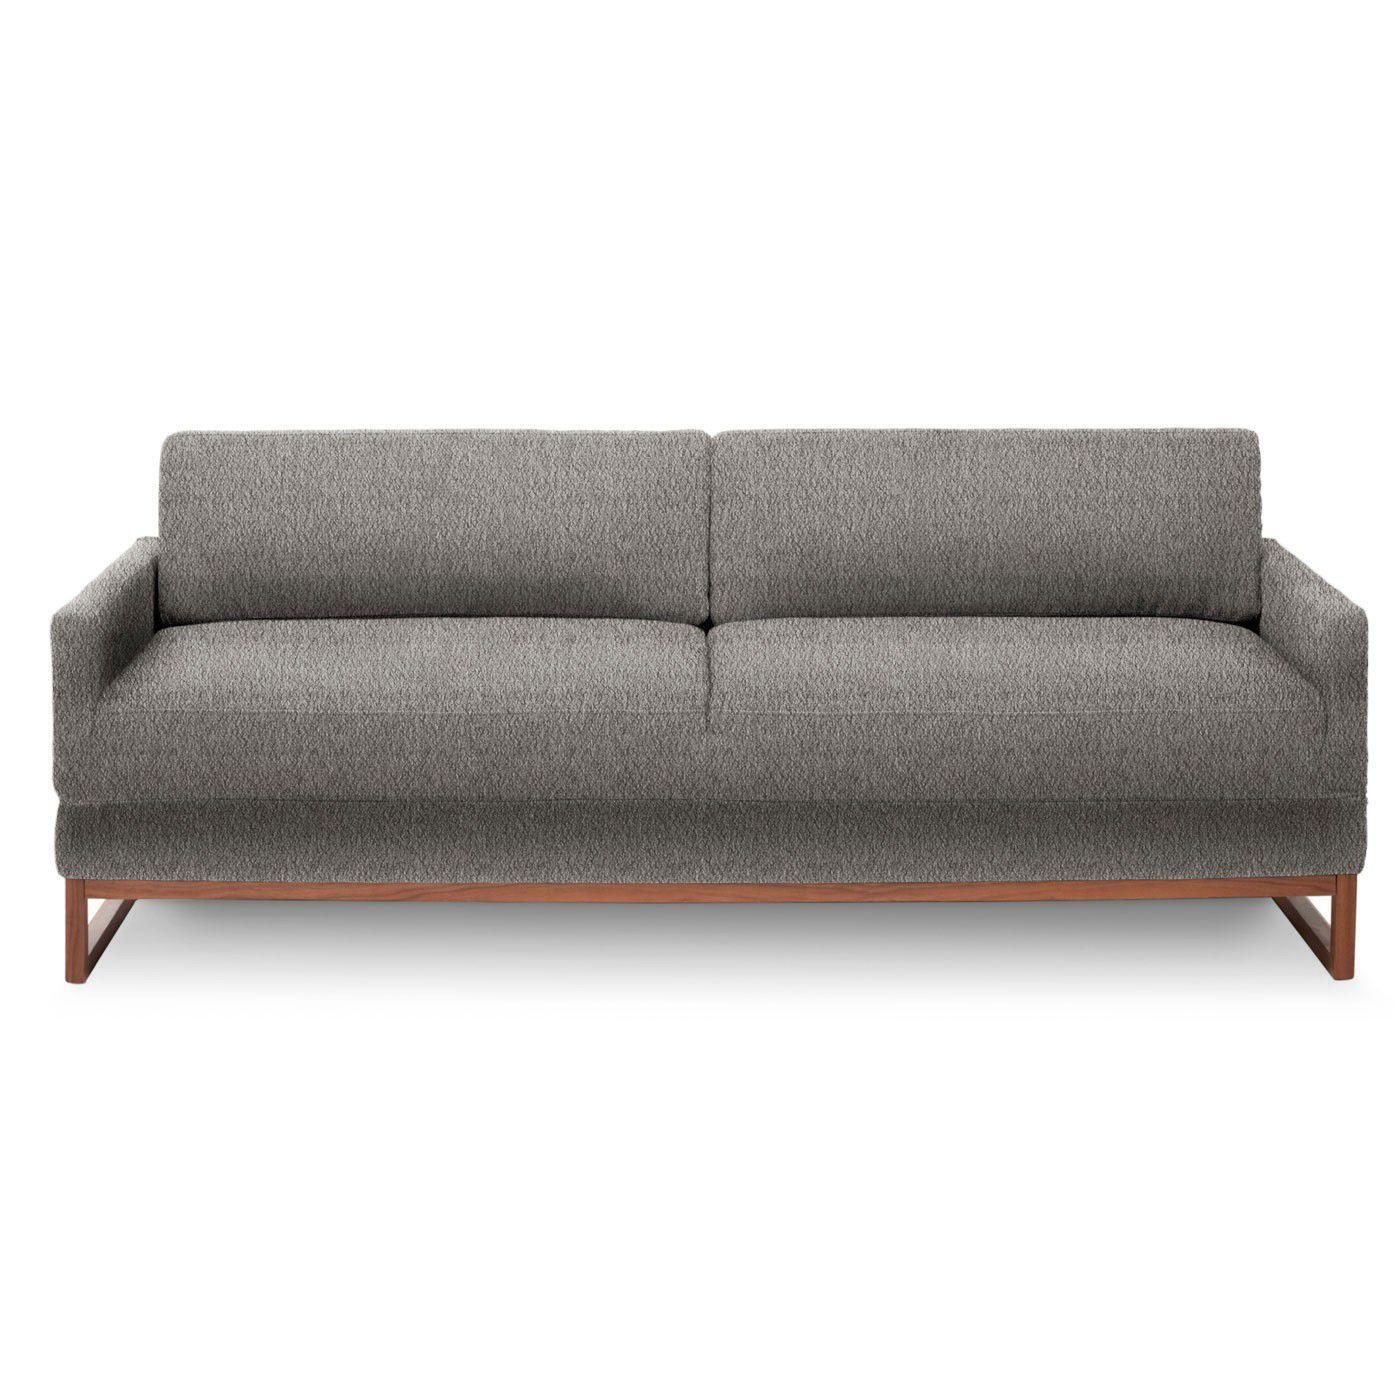 sofa bed / contemporary / fabric / beige